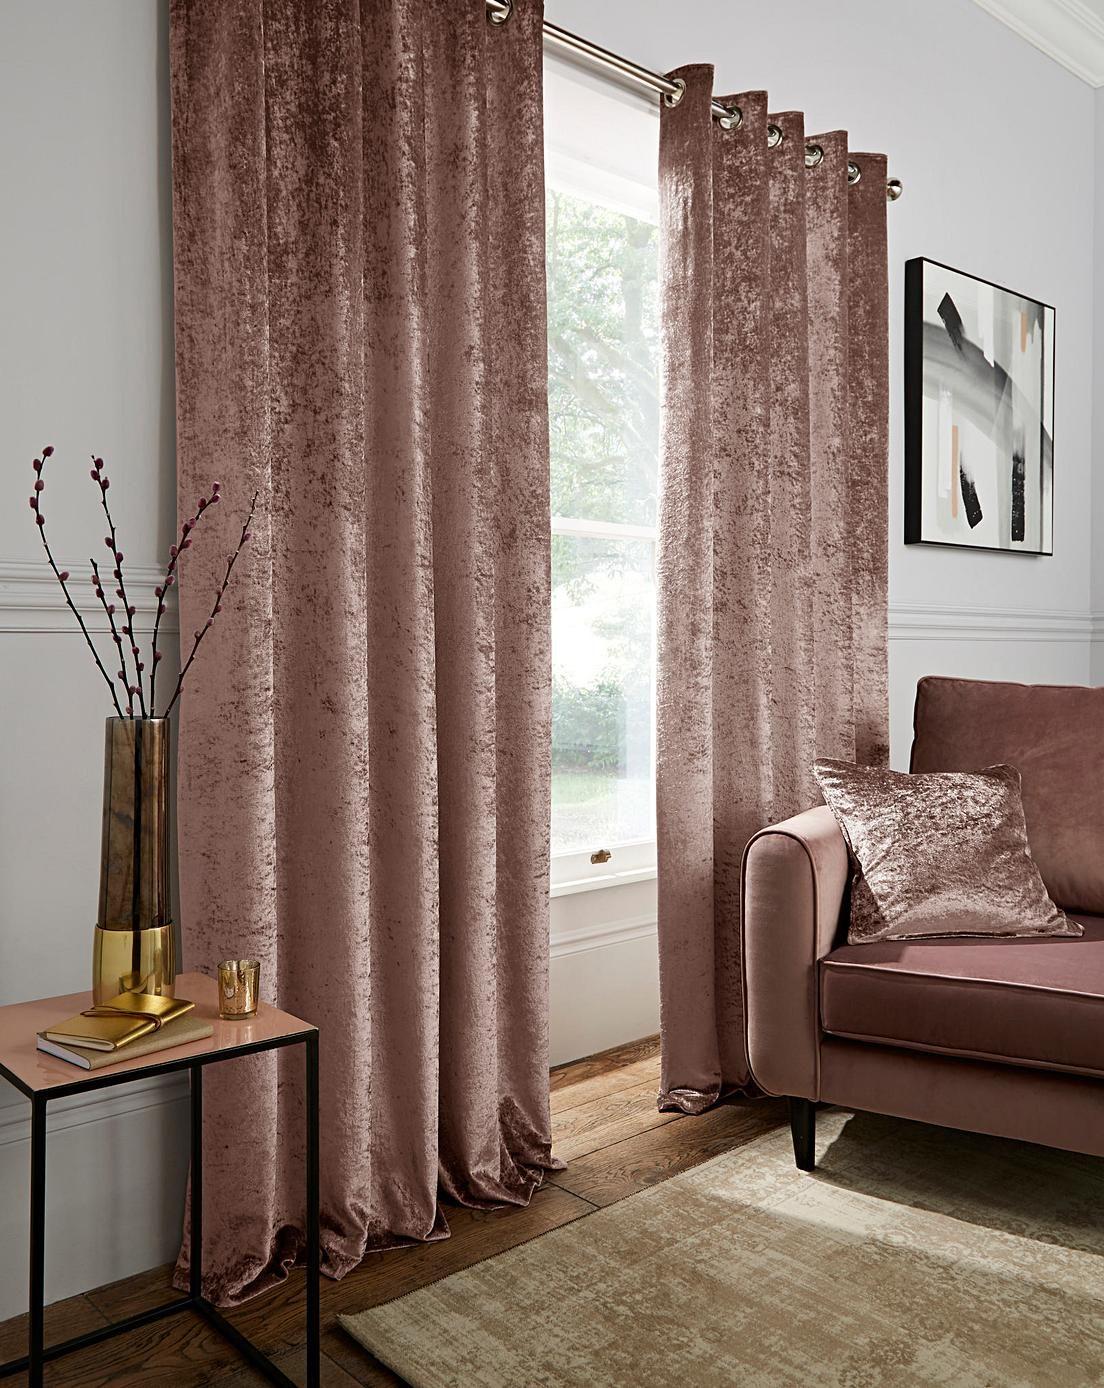 Crushed Velvet Eyelet Curtains Gold Curtains Living Room Curtains Living Room Gold Curtains Bedroom